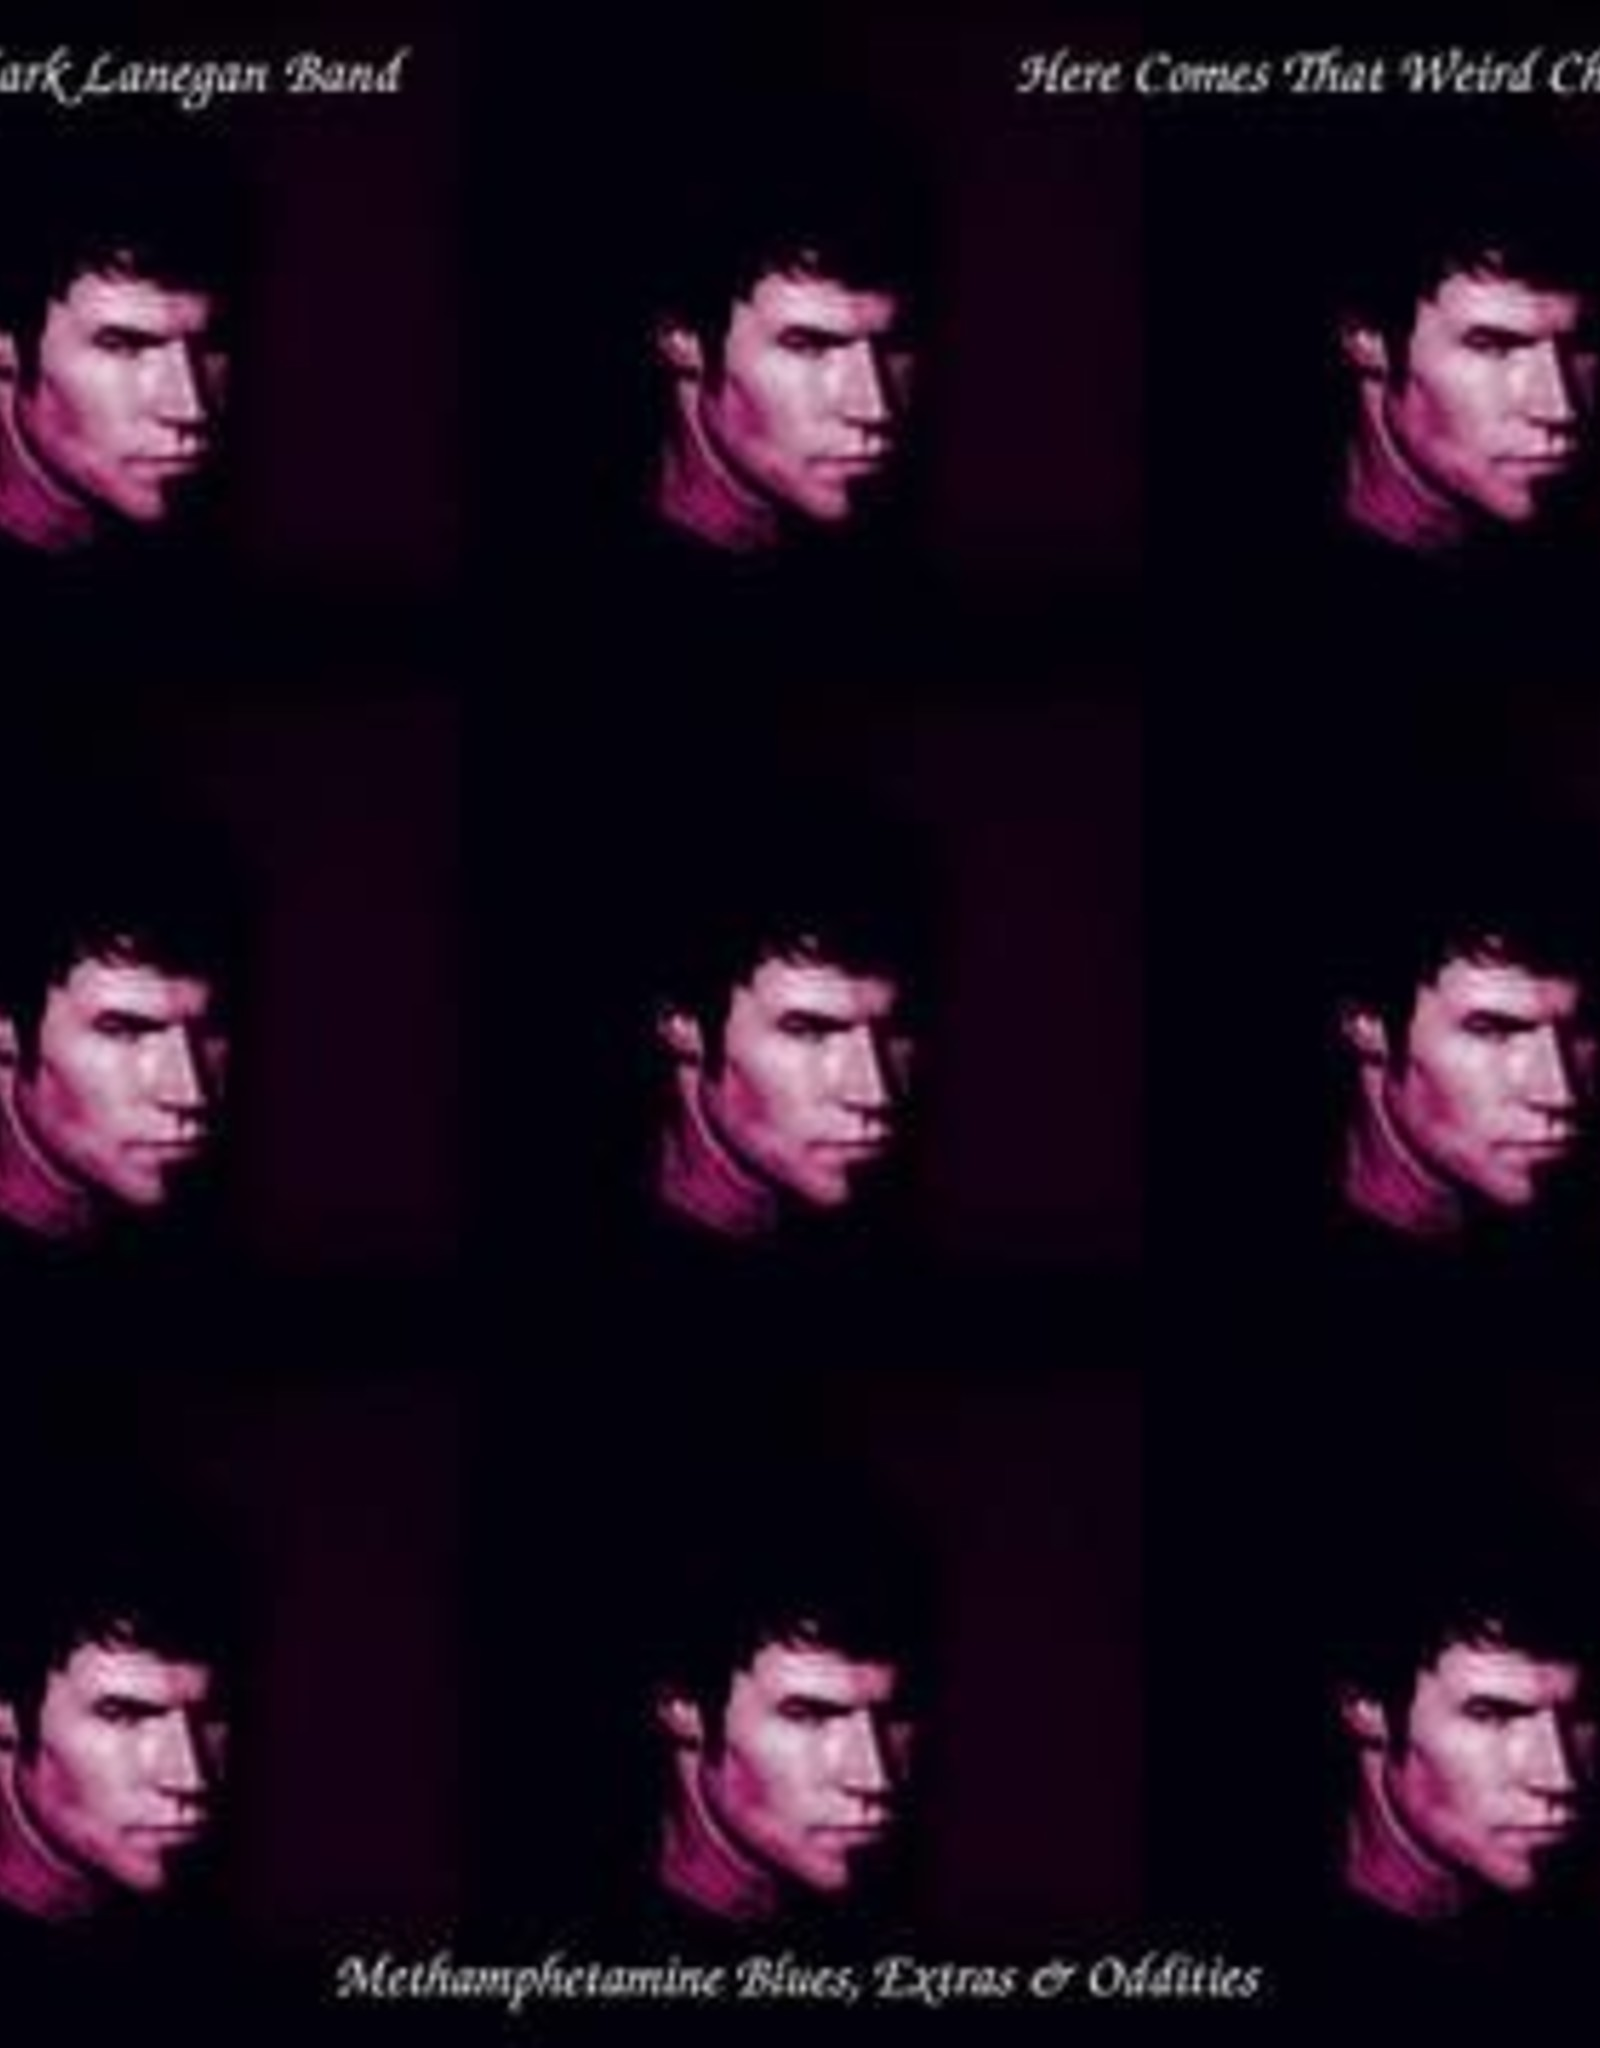 Mark Lanegan - Here Comes That Weird Chill (Methamphetamine Blues, Extras & Oddities) (Pink Vinyl) (RSD 6/21)